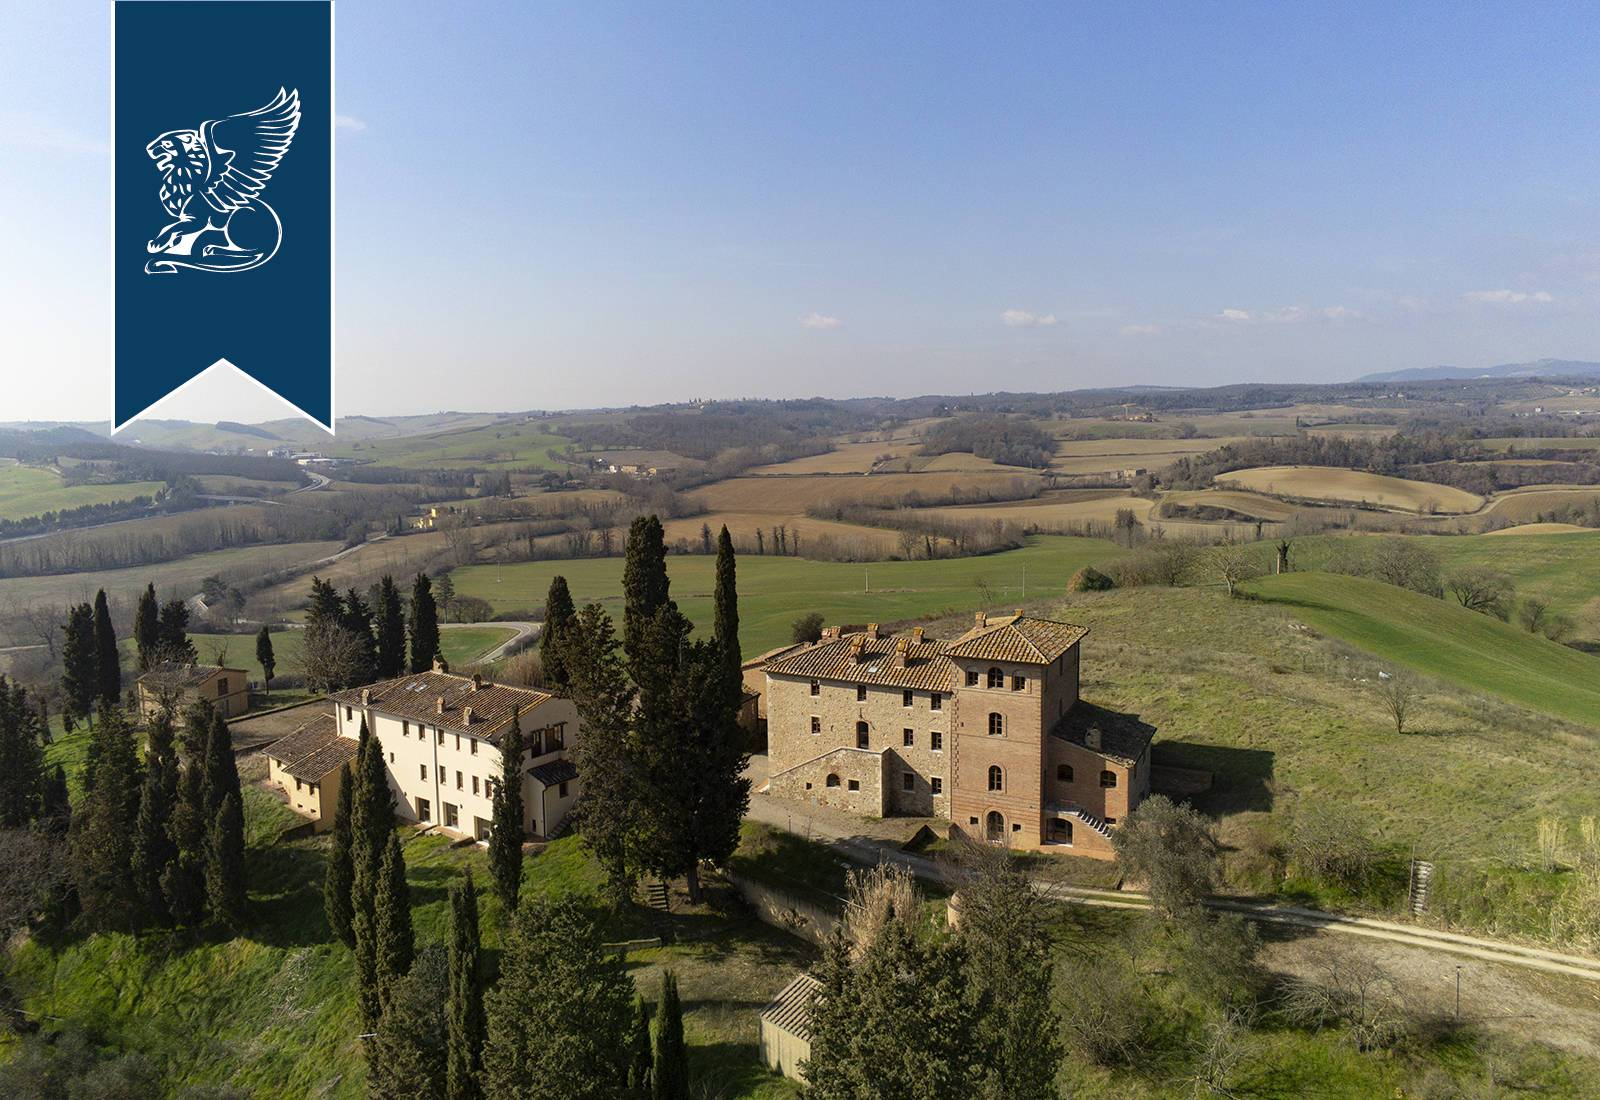 Agriturismo in Vendita a Castelnuovo Berardenga: 0 locali, 2500 mq - Foto 4